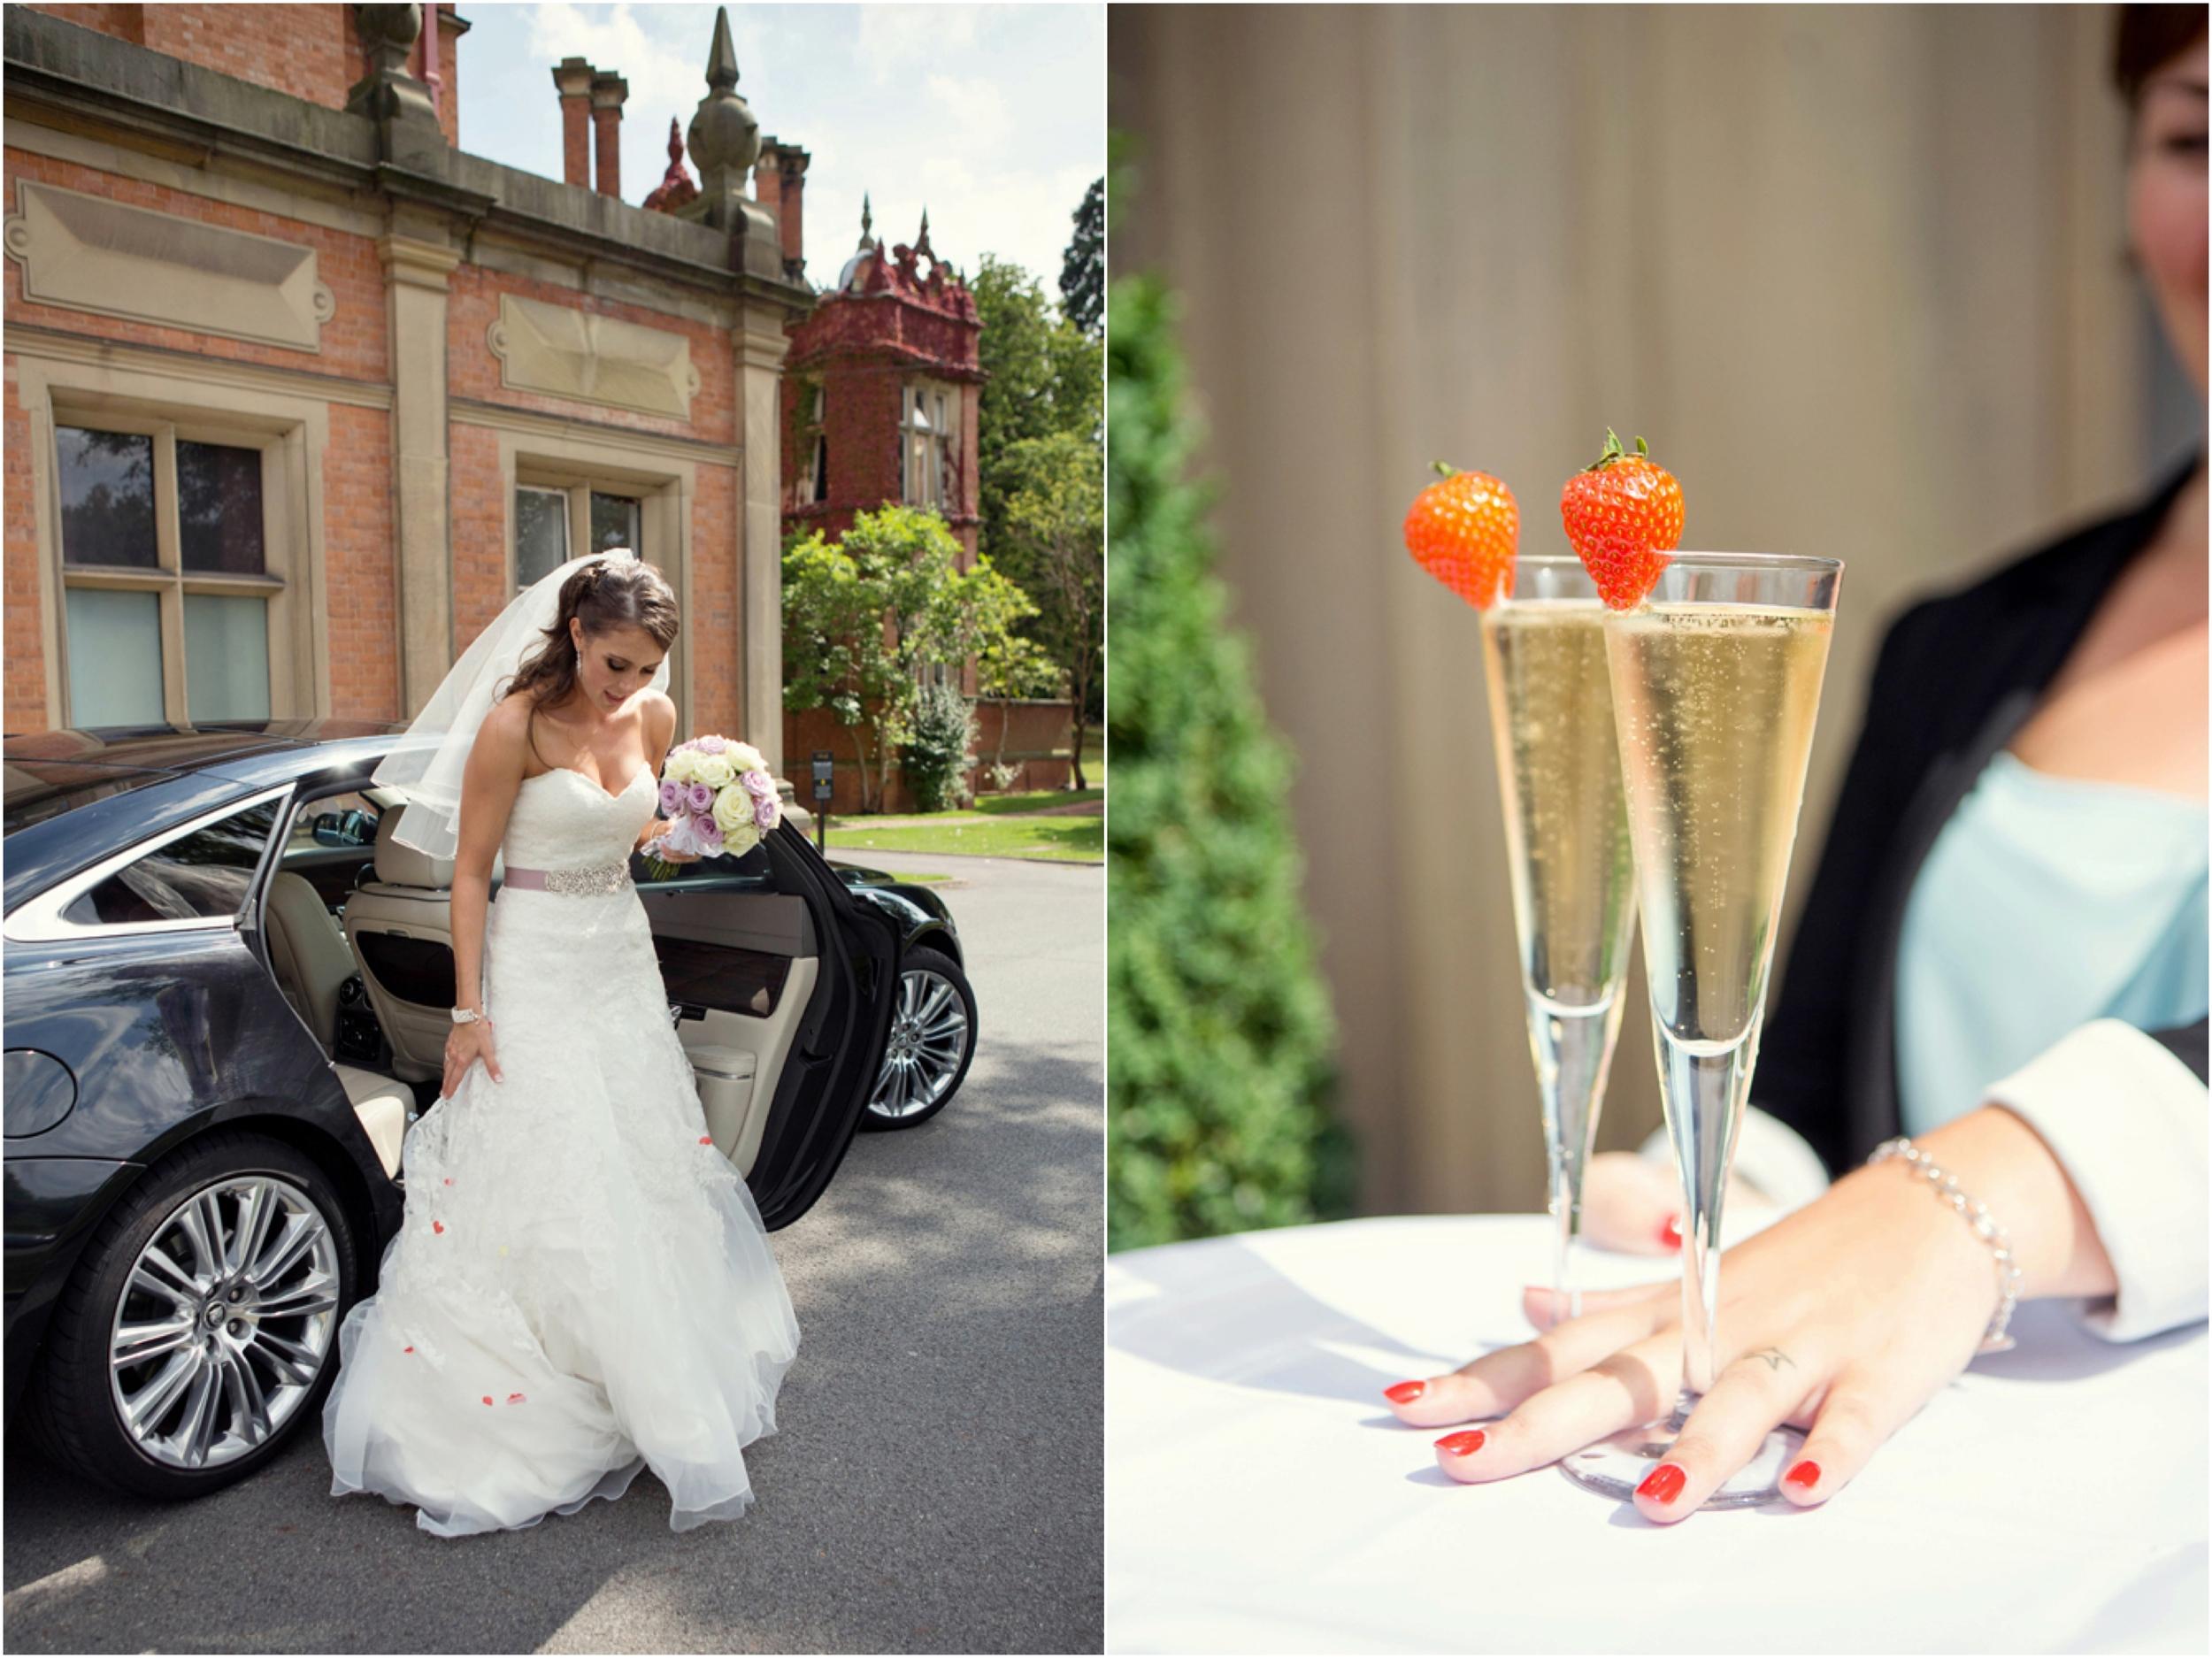 Sophie Evans Photography, Warwickshire Wedding Photography, Welcombe Hotel  (47).jpg